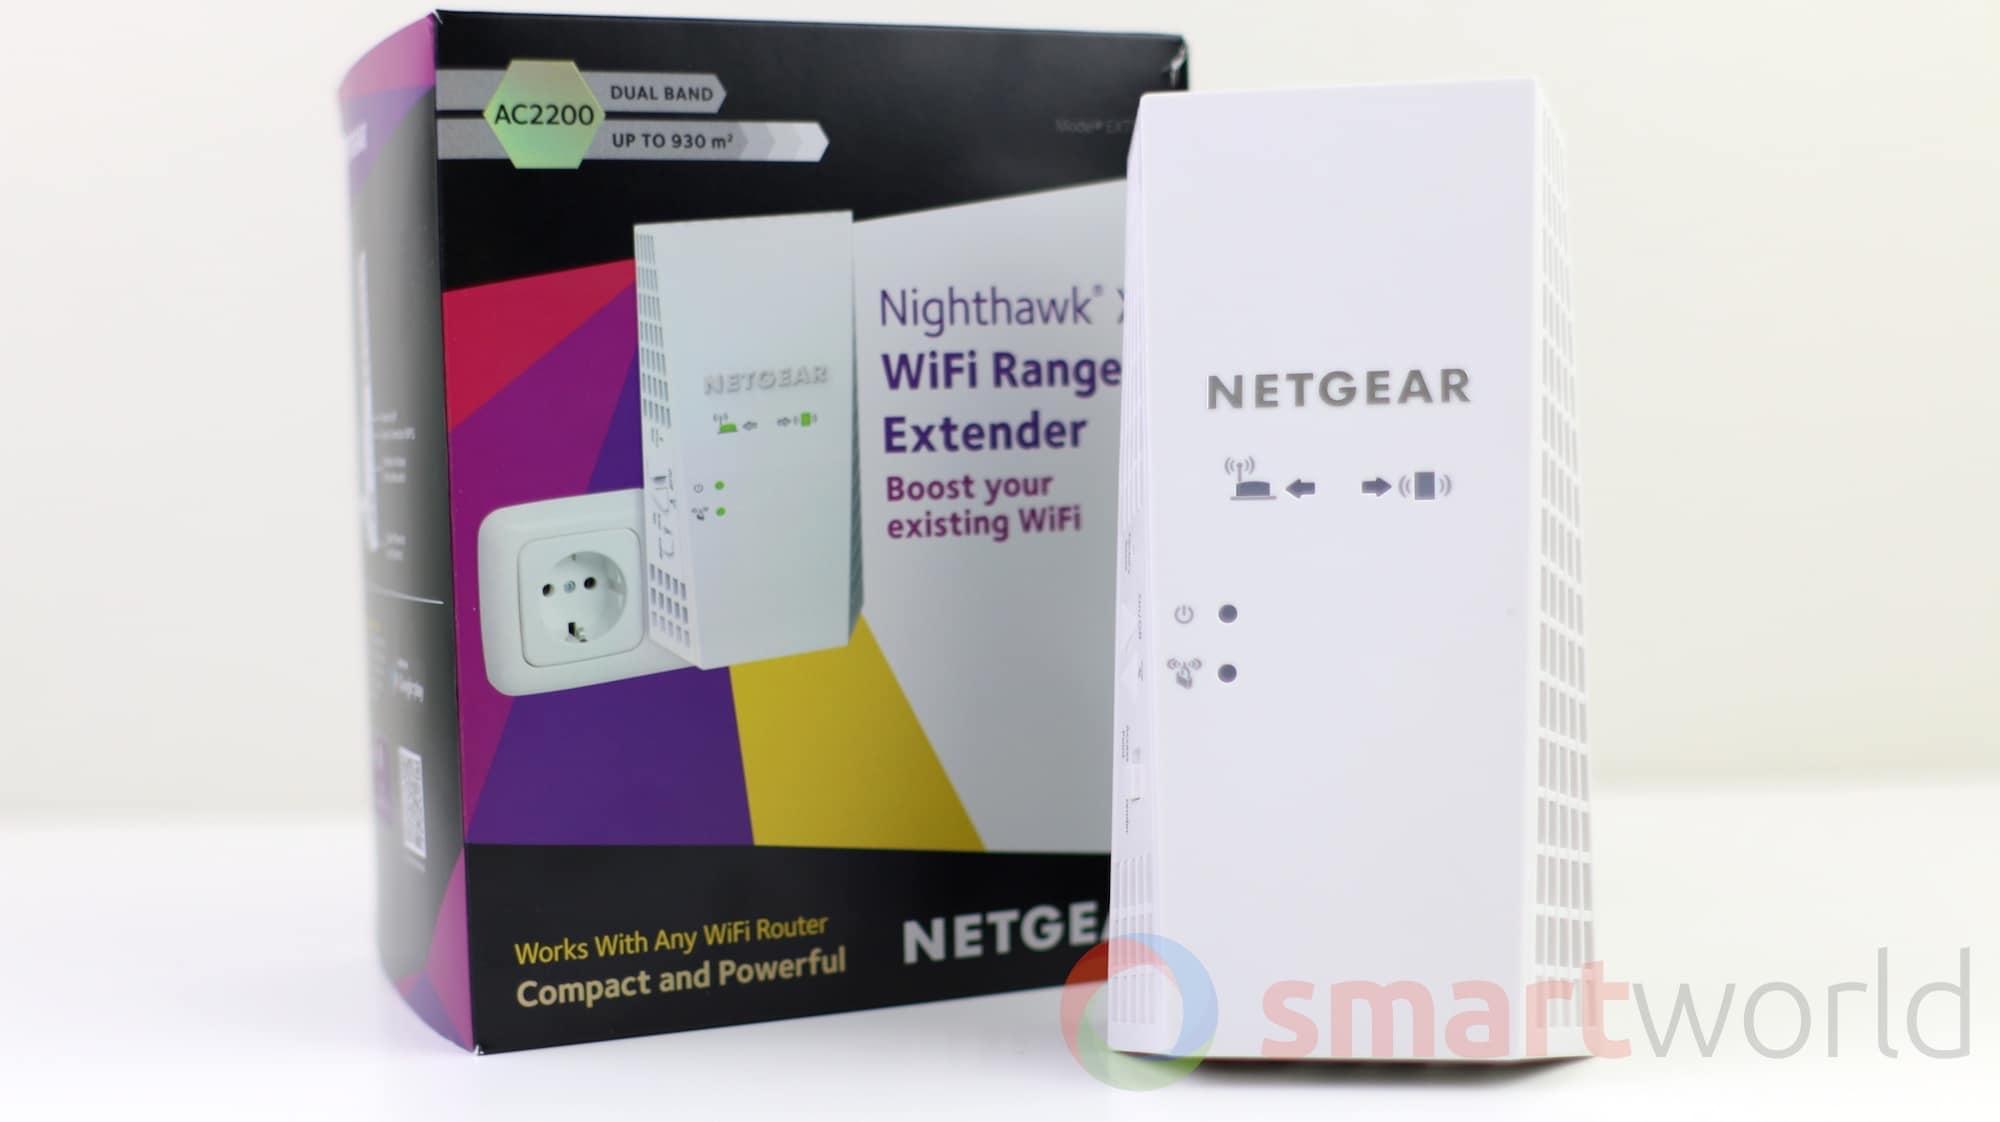 Netgear Nighthawk X4 05